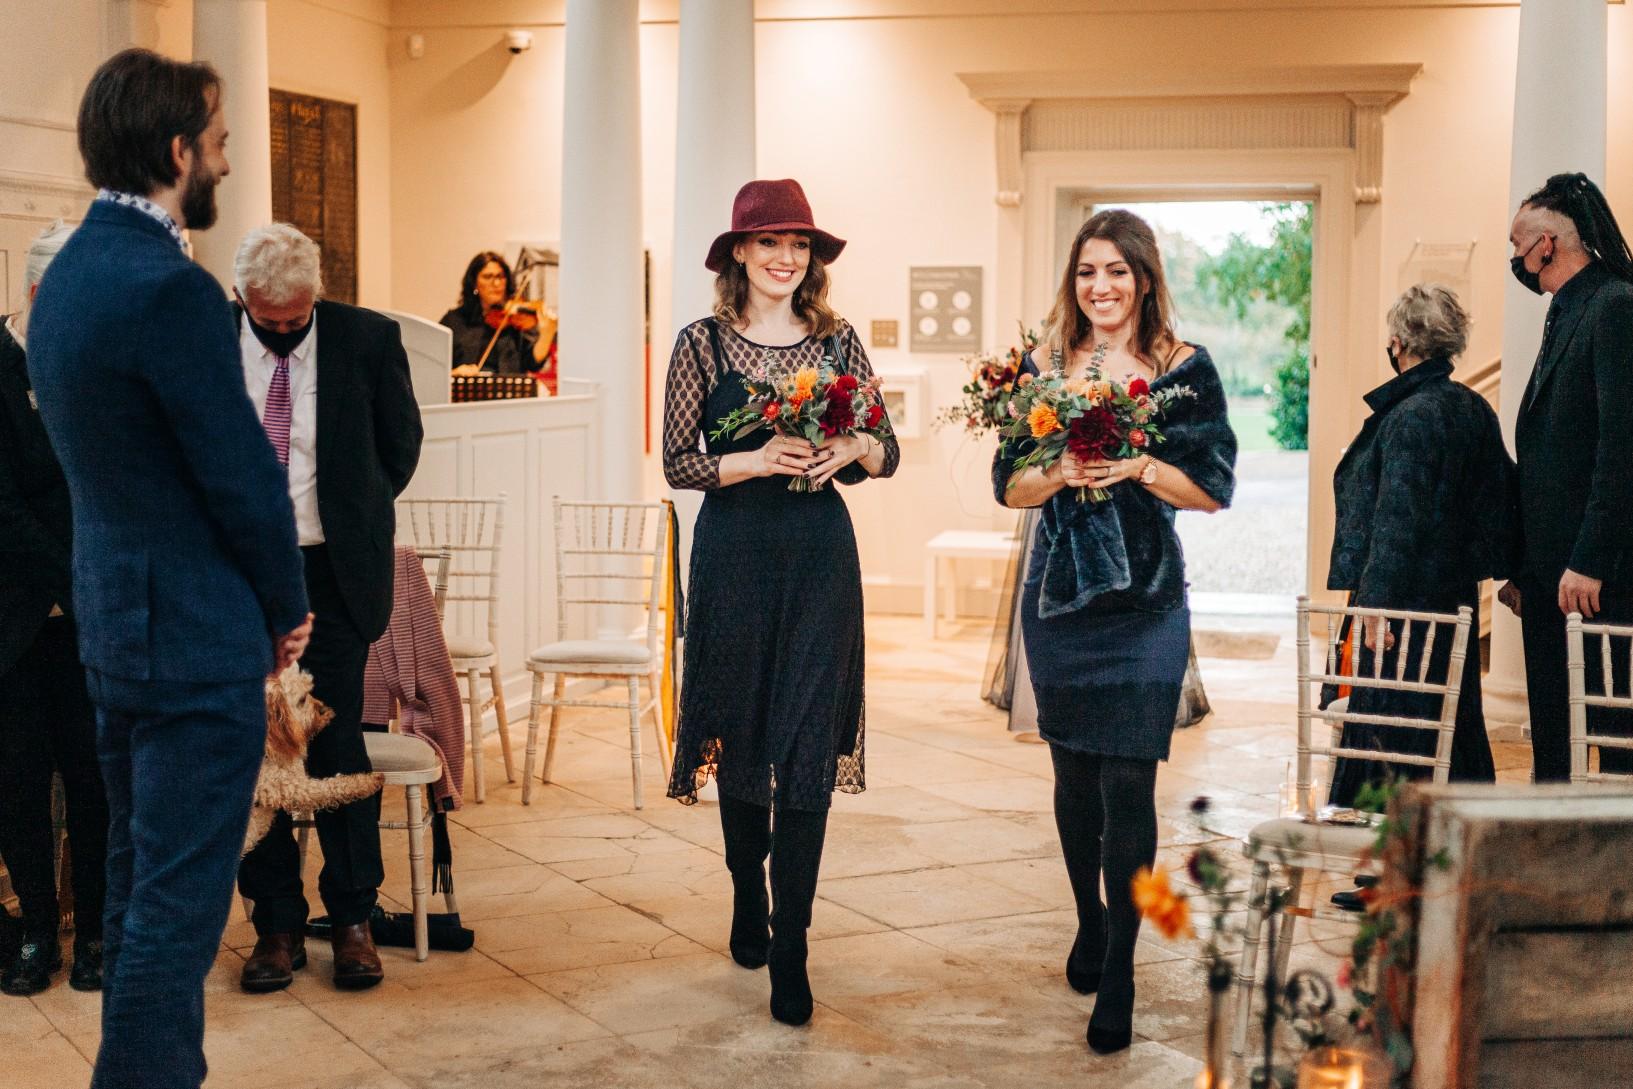 intimate alternative wedding - alternative micro wedding - small wedding inspiration